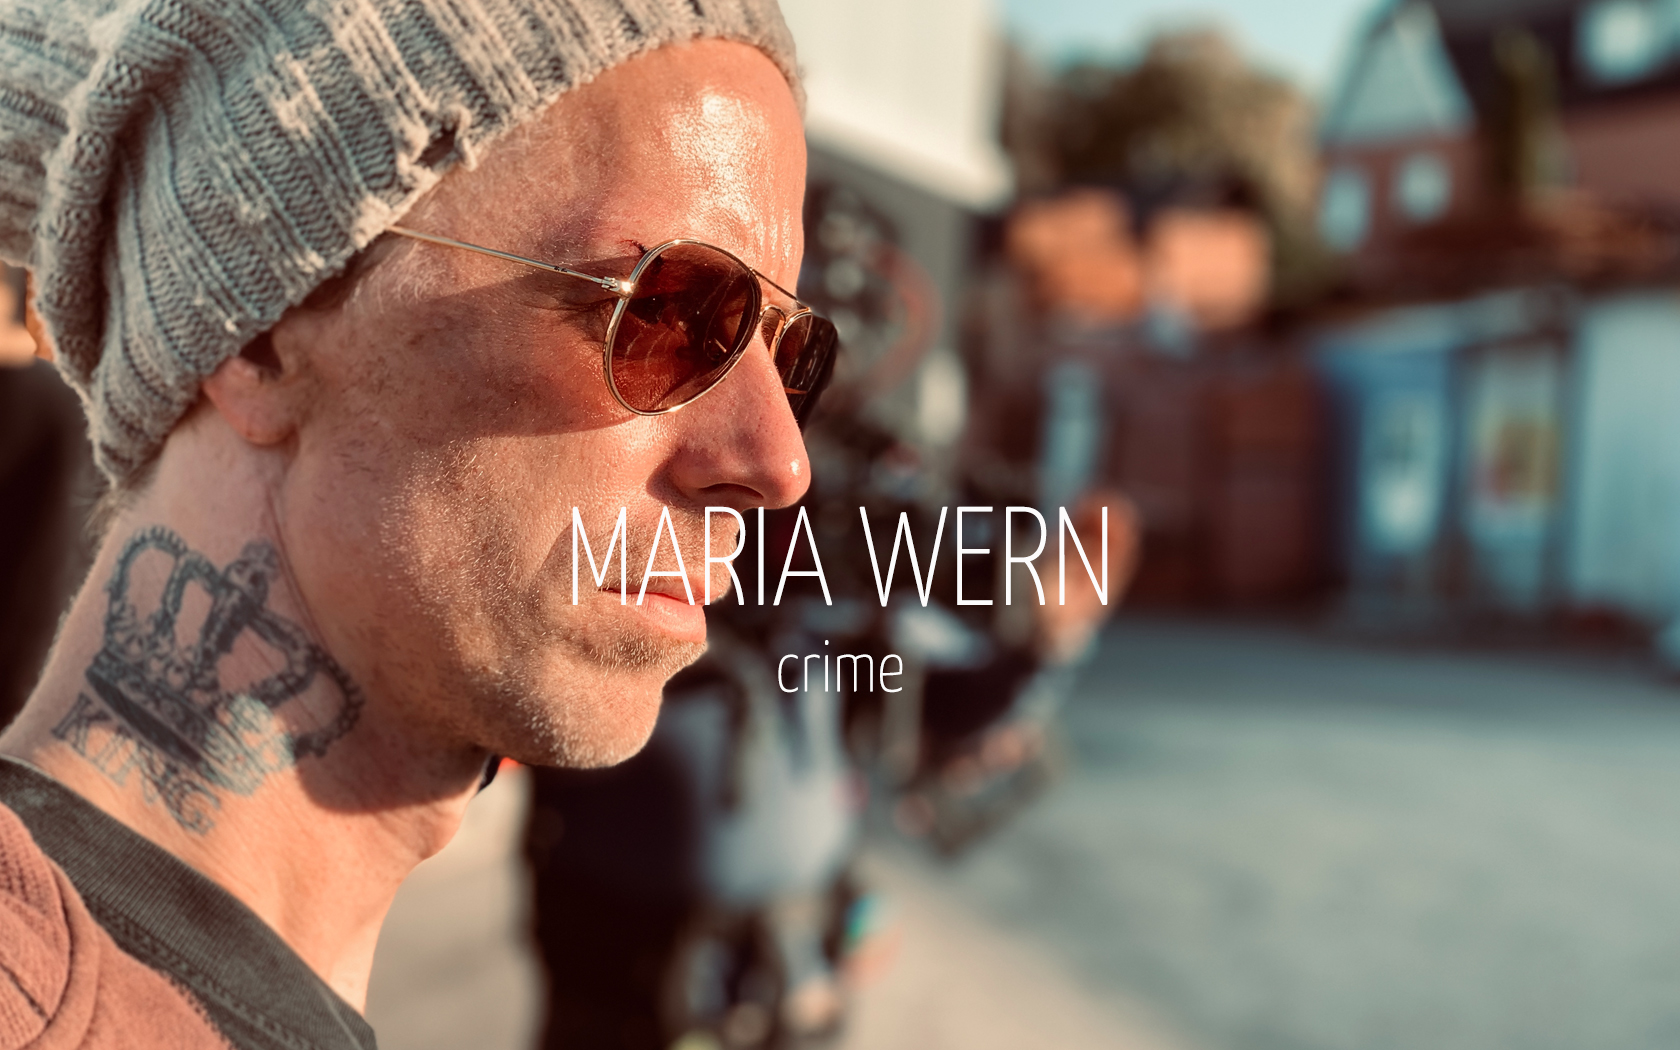 Scandinavian actor Fredrik Wagner as Marcus Kurhonen in crime drama film Maria Wern